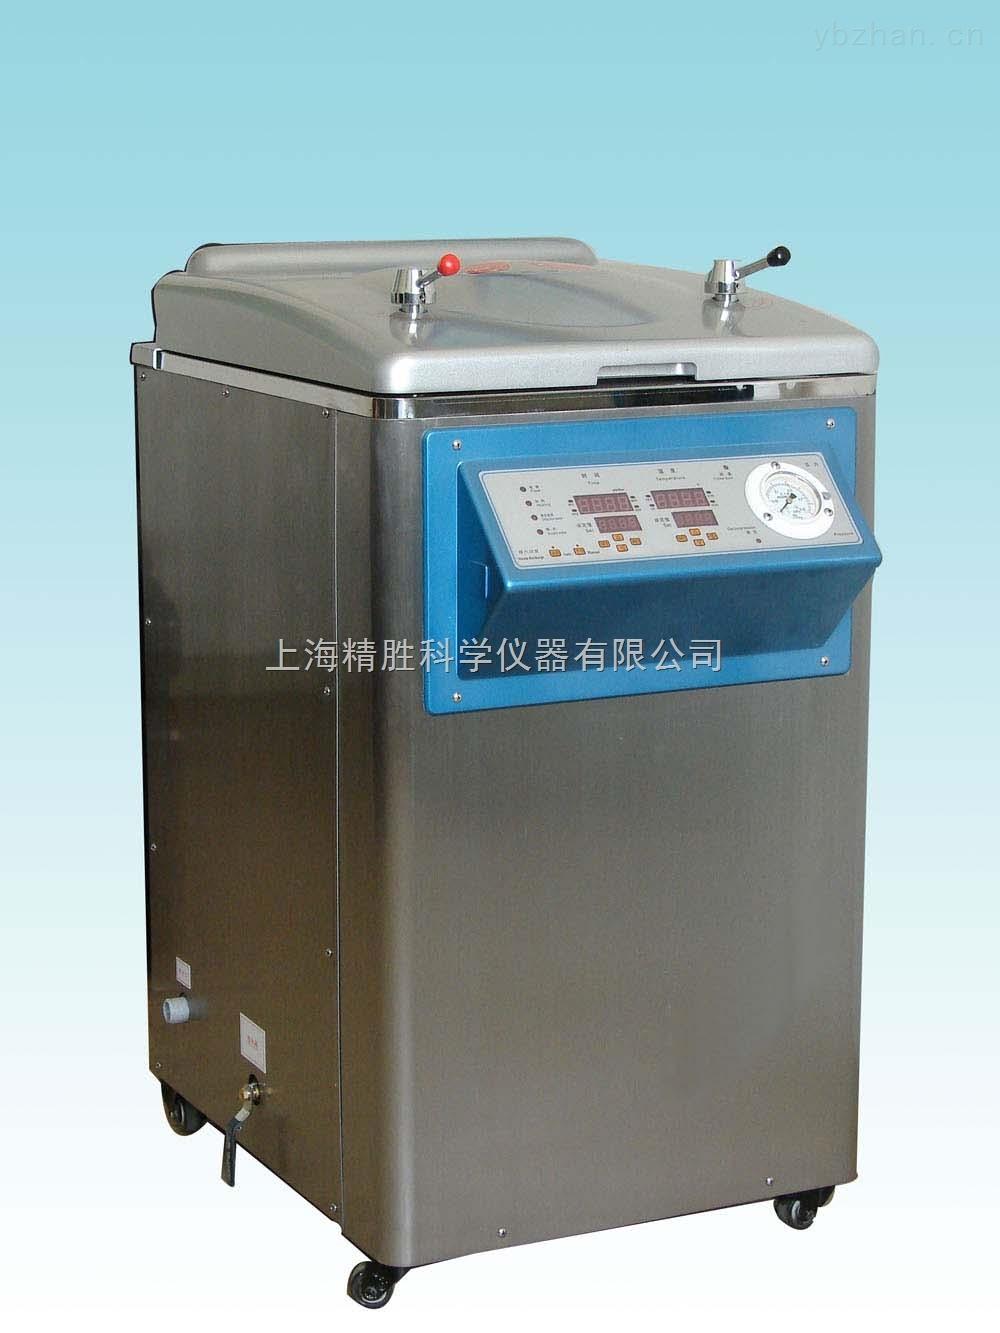 YM30Z/YM50Z/YM75-立式压力蒸汽灭菌器(智能控制型)